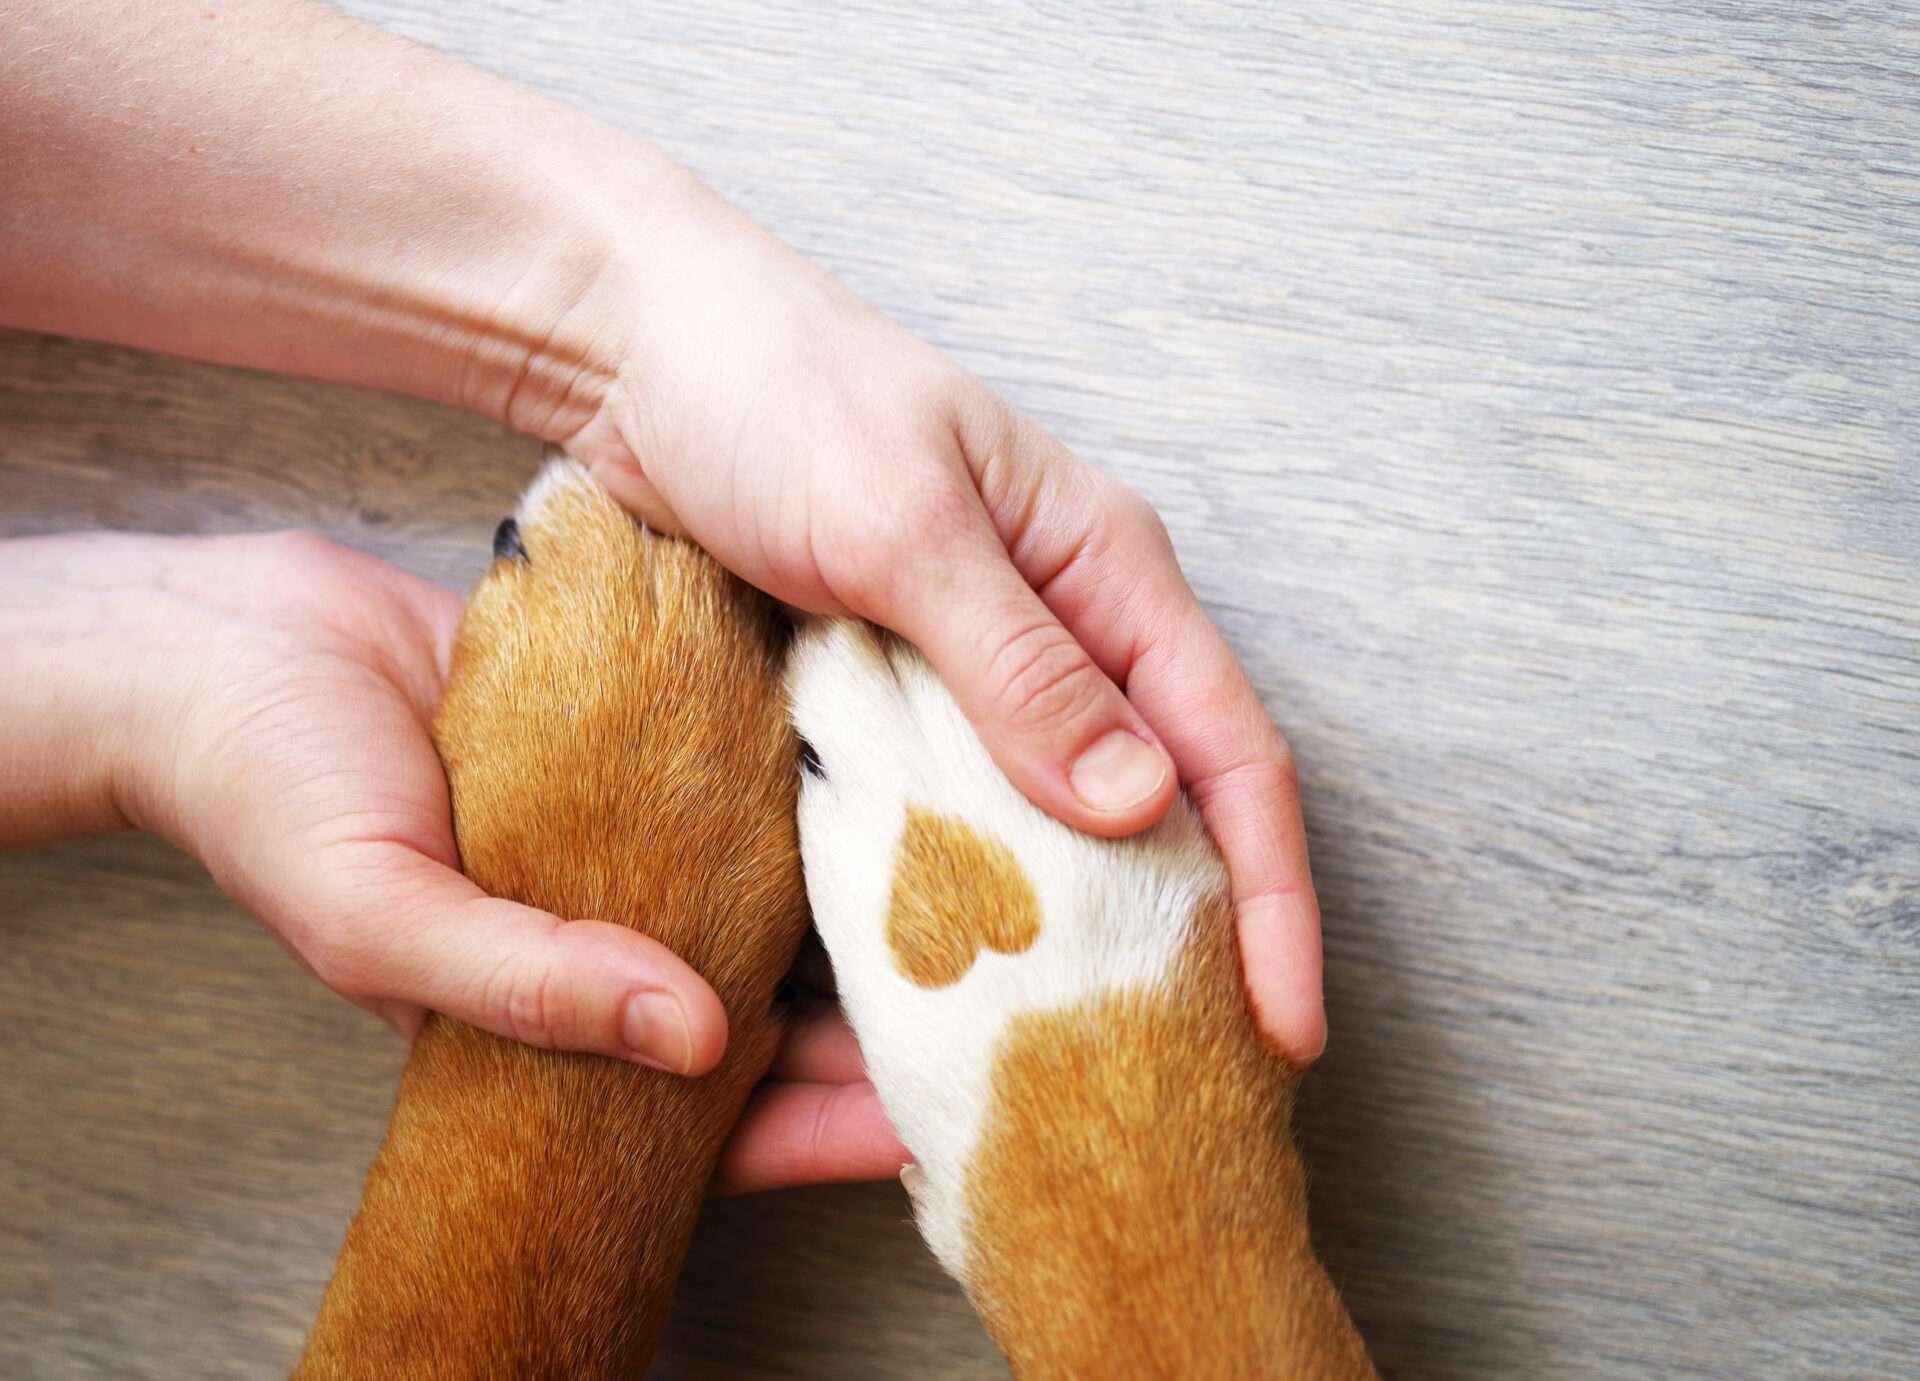 Children caring for animals